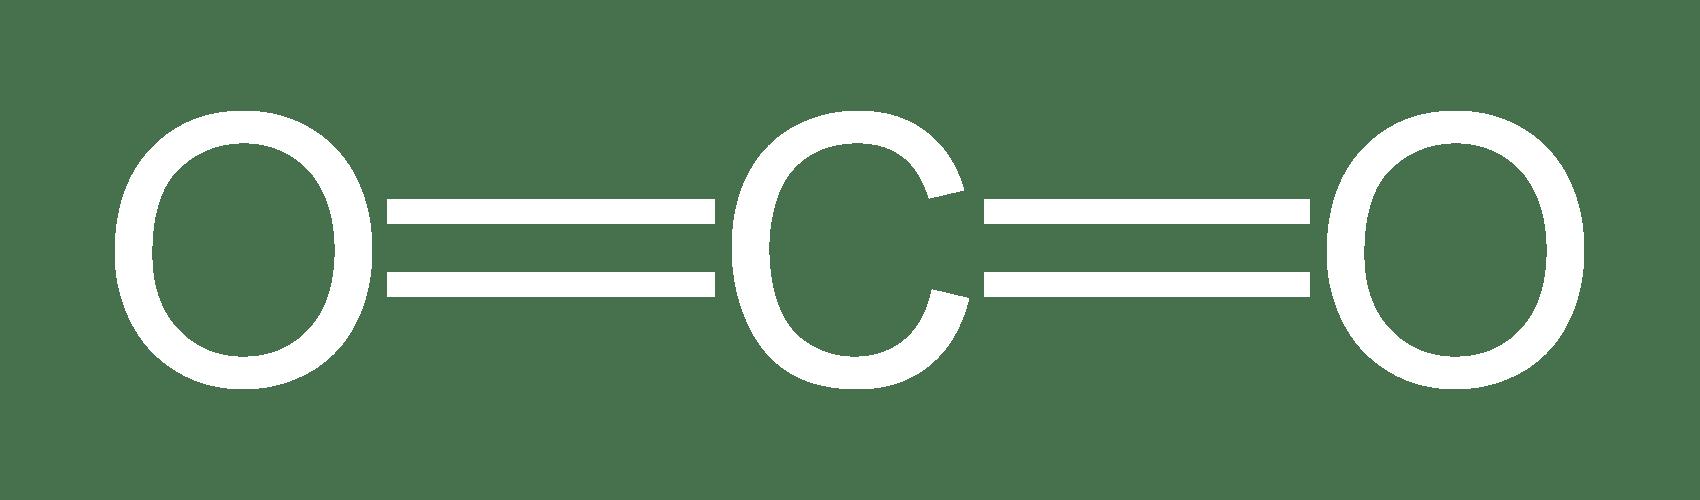 CO2 formel